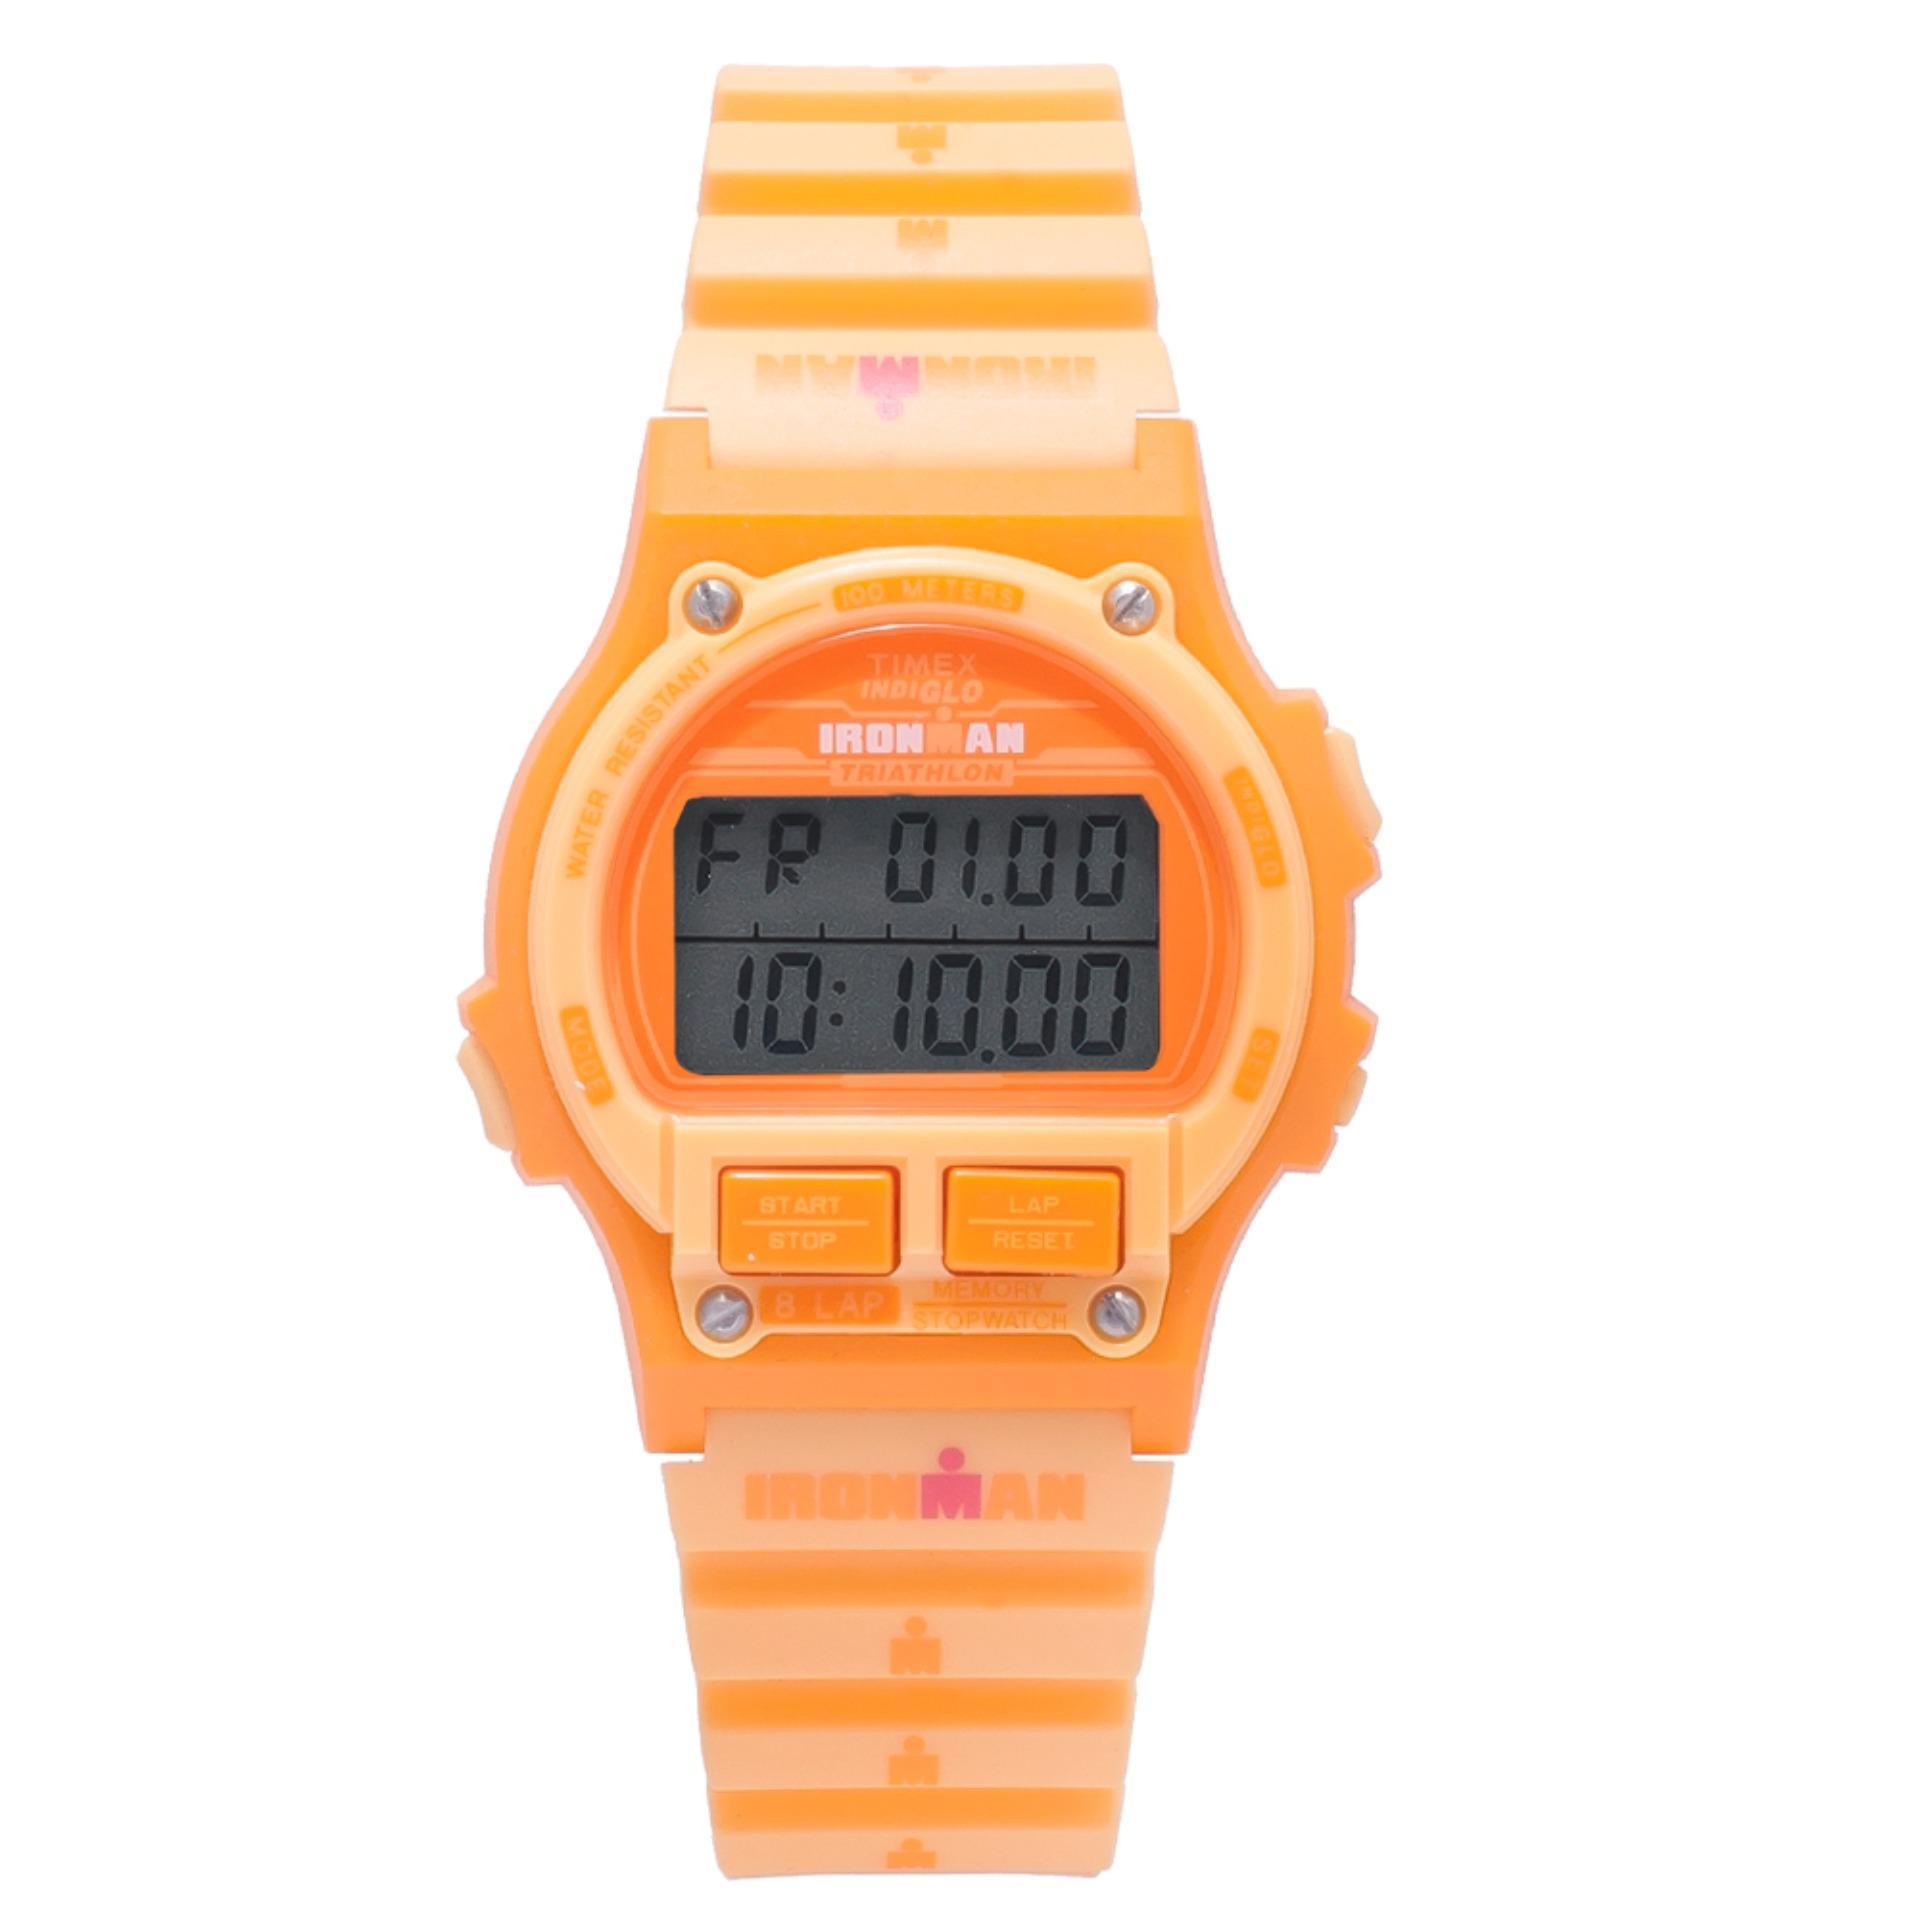 8f2834b0e5c2 Timex Ironman 8 Lap Orange Digital Rubber Watch TW5M04500 SPORTS